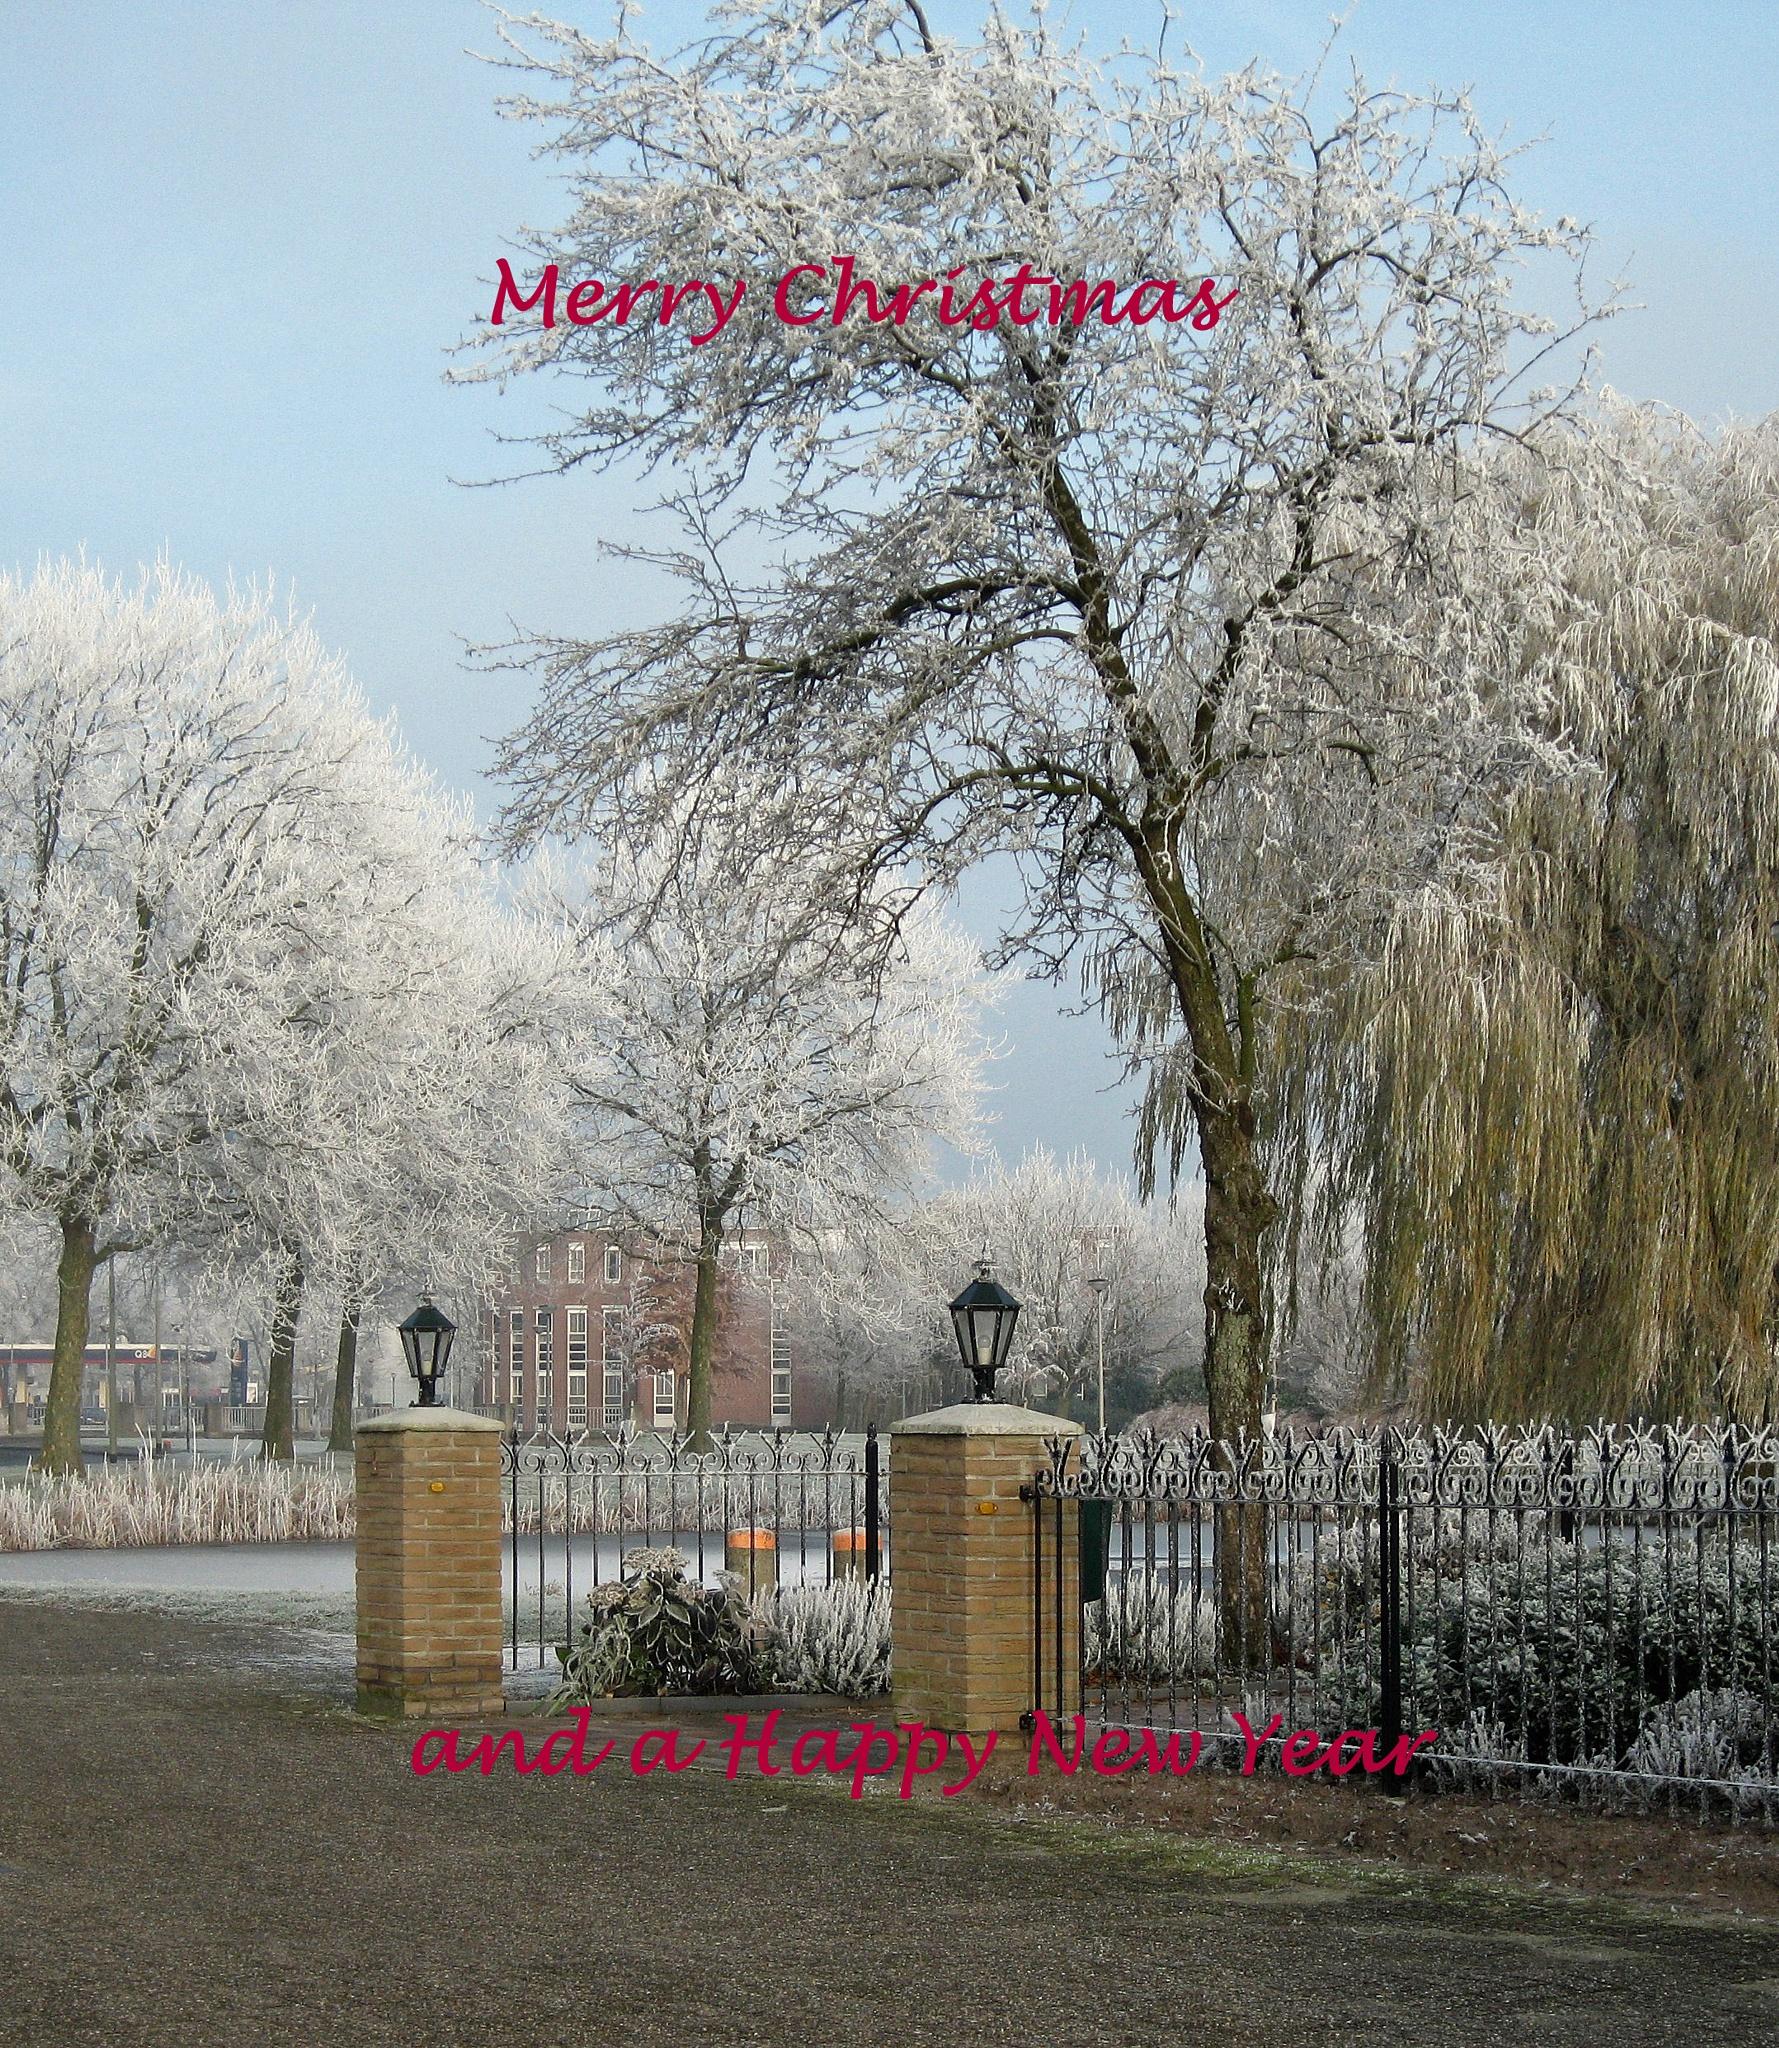 christmas carrd by Tineke Deuntje